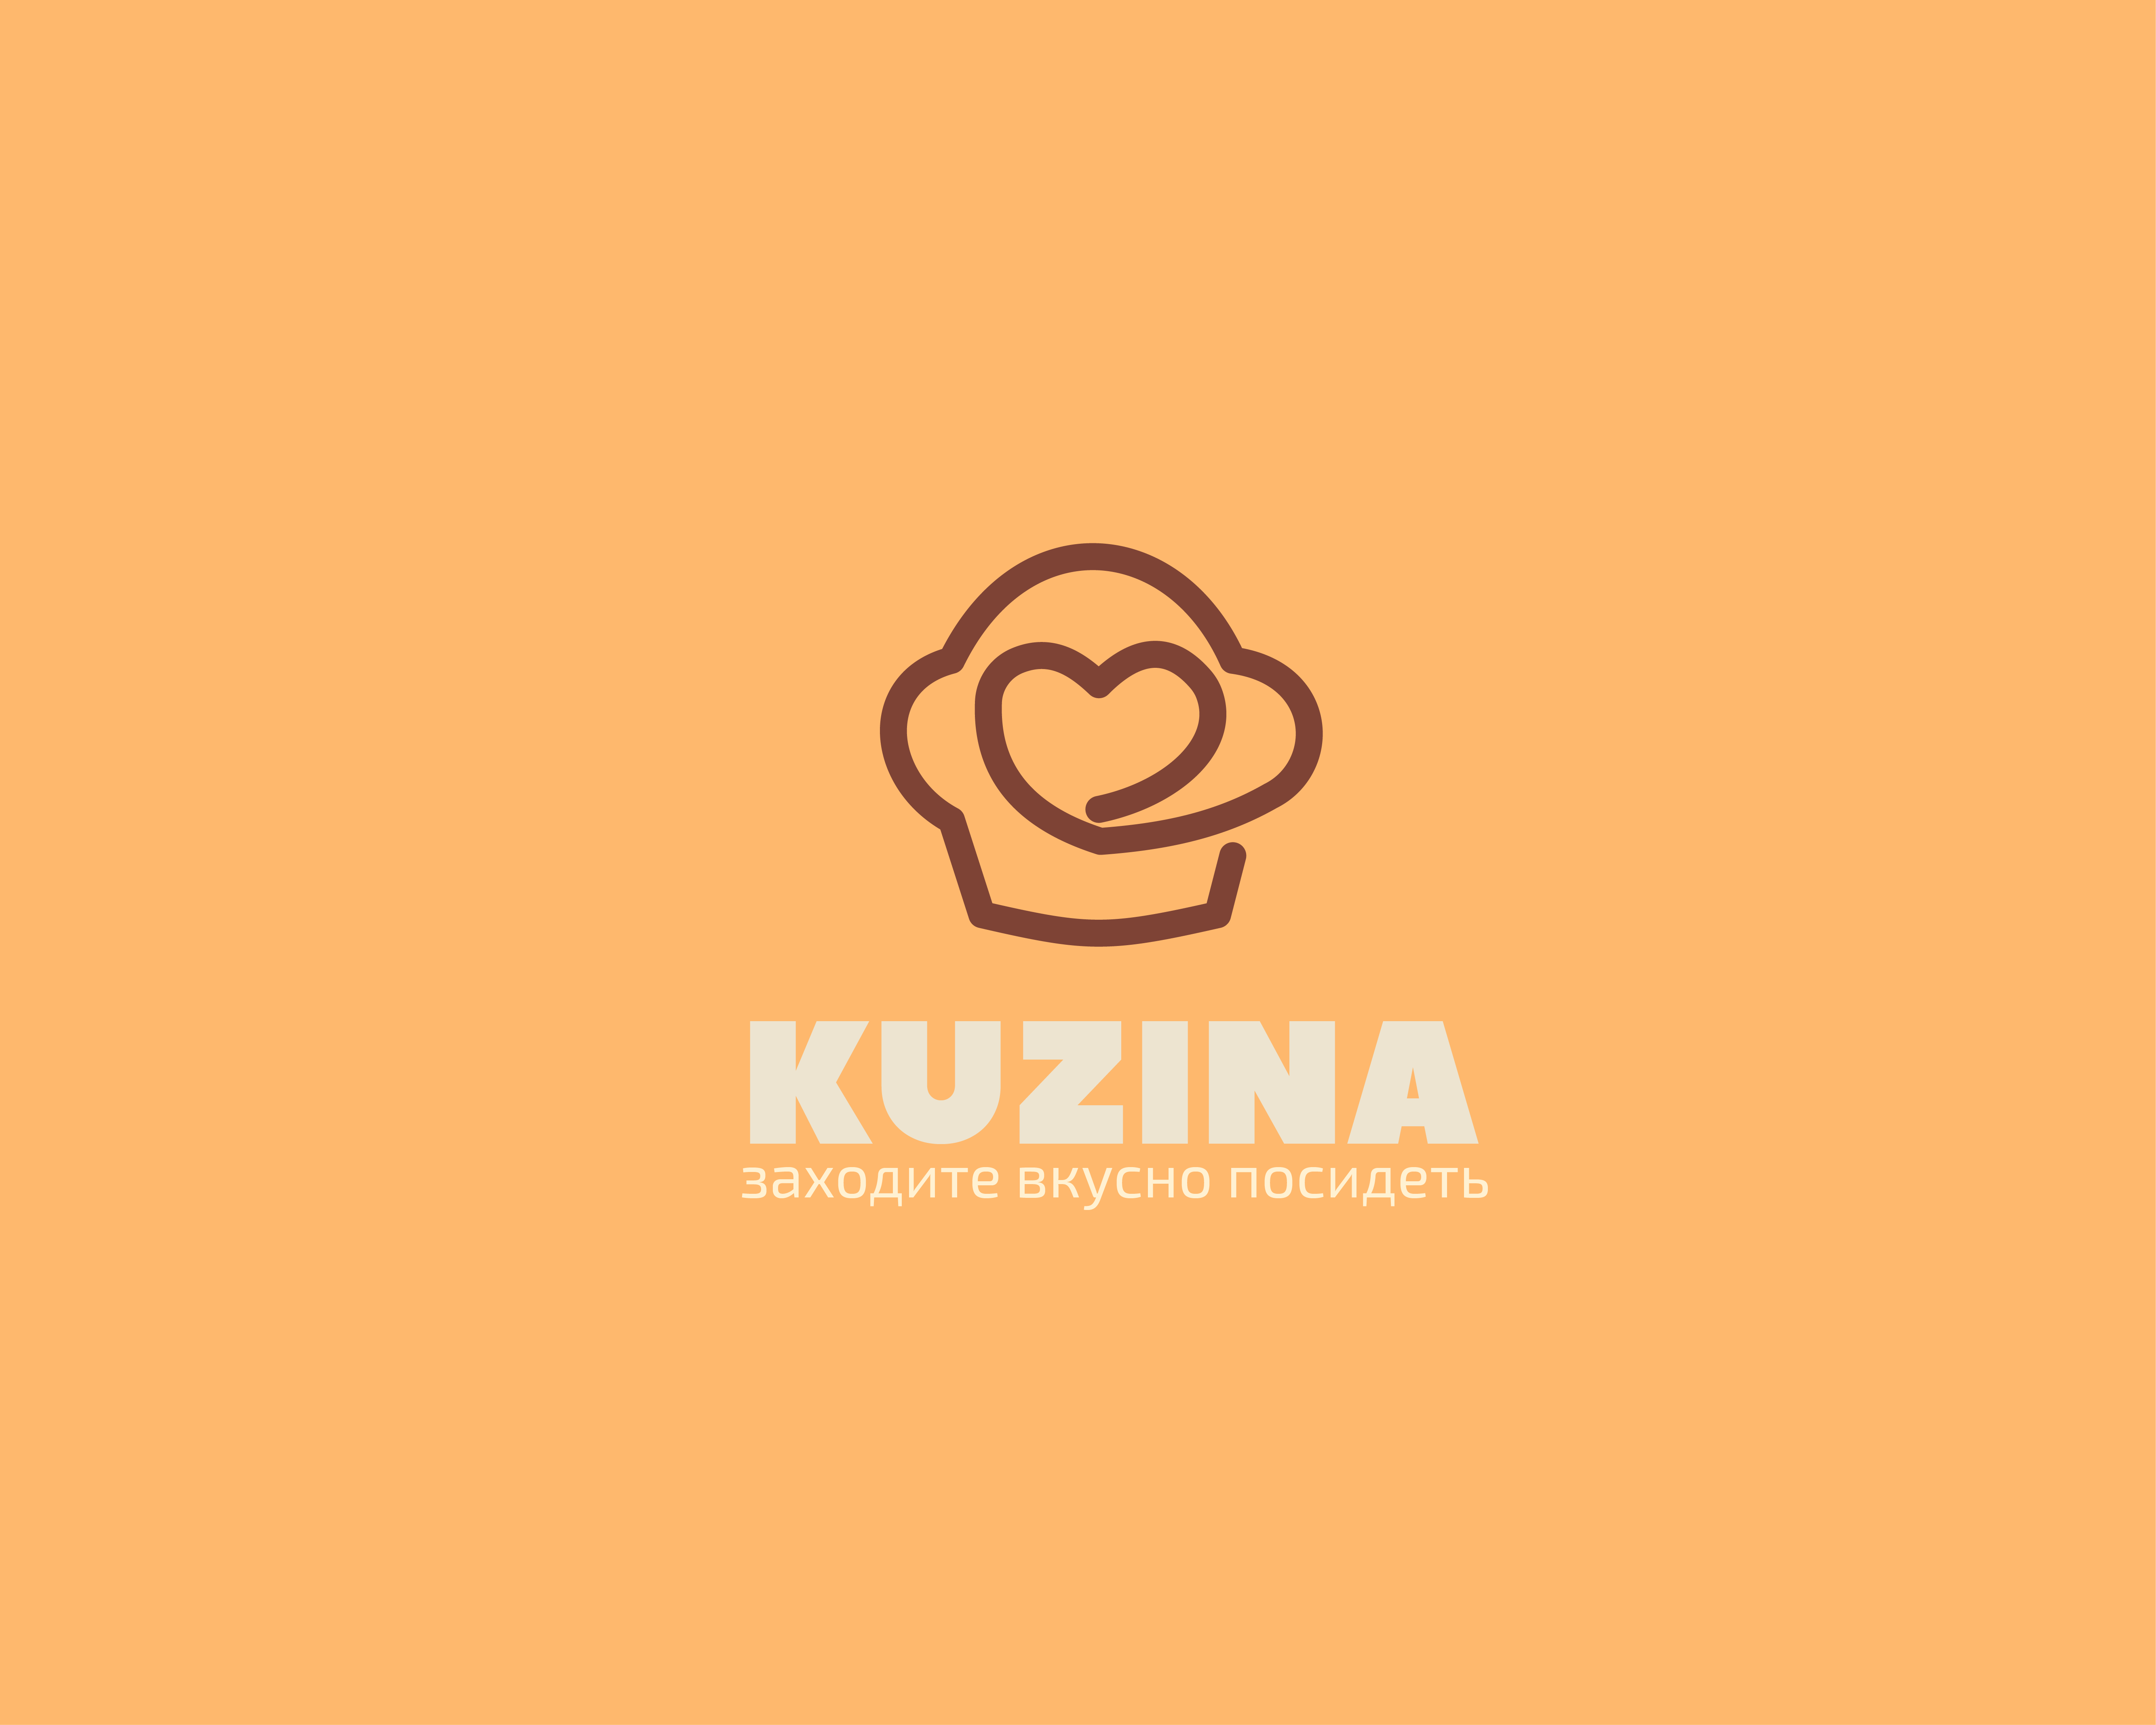 Kuzina - кондитерская